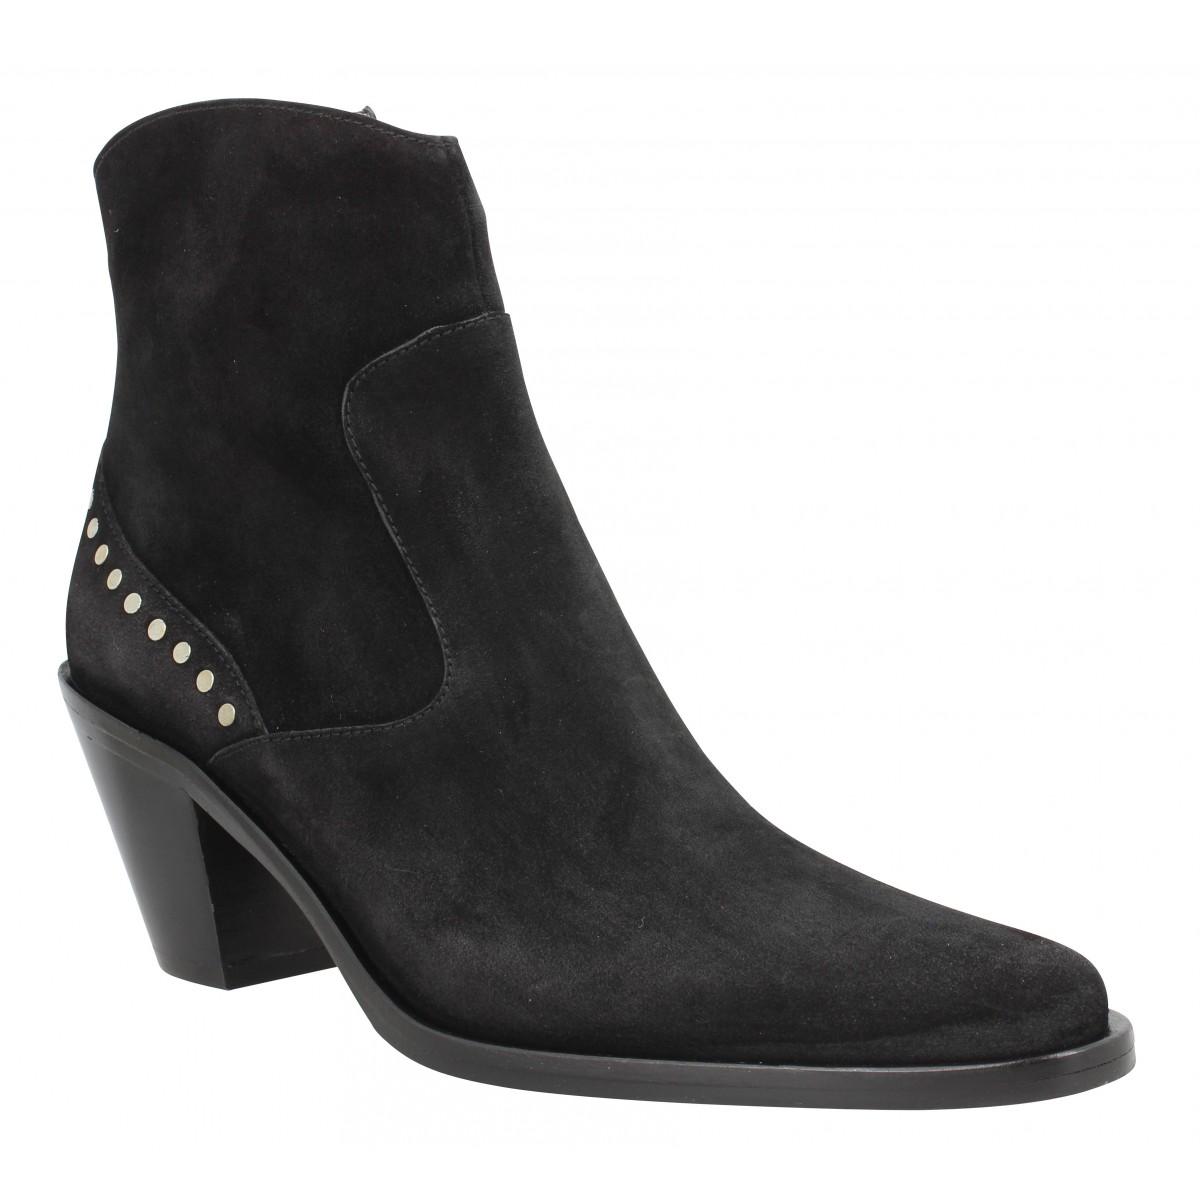 Bottines FREE LANCE Jane 7 Stud Western Zip Boot velours Femme Noir